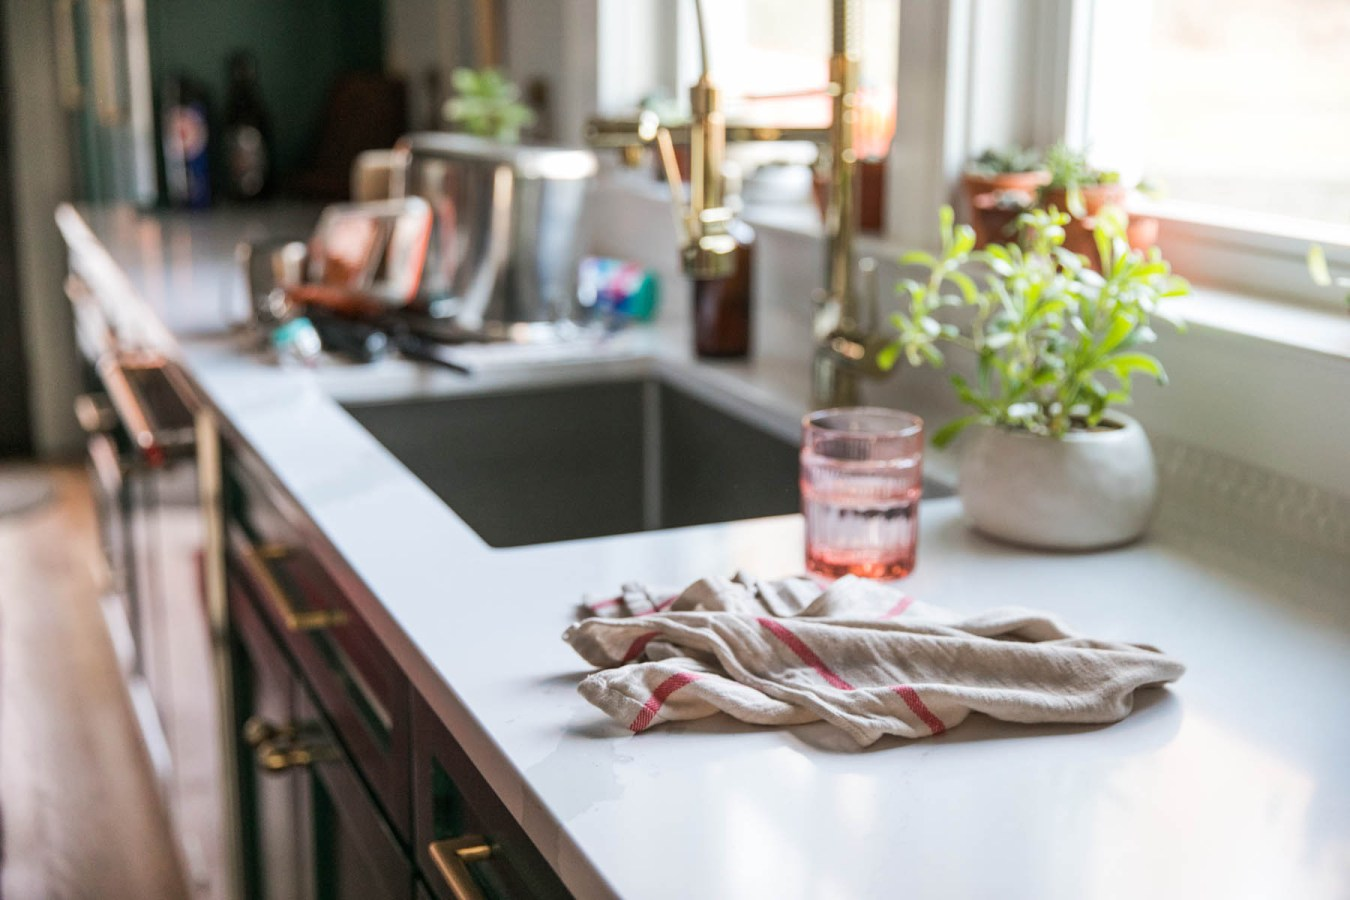 14 Easy Kitchen Hacks + Ideas For Better Organization | JessicaBrigham.com